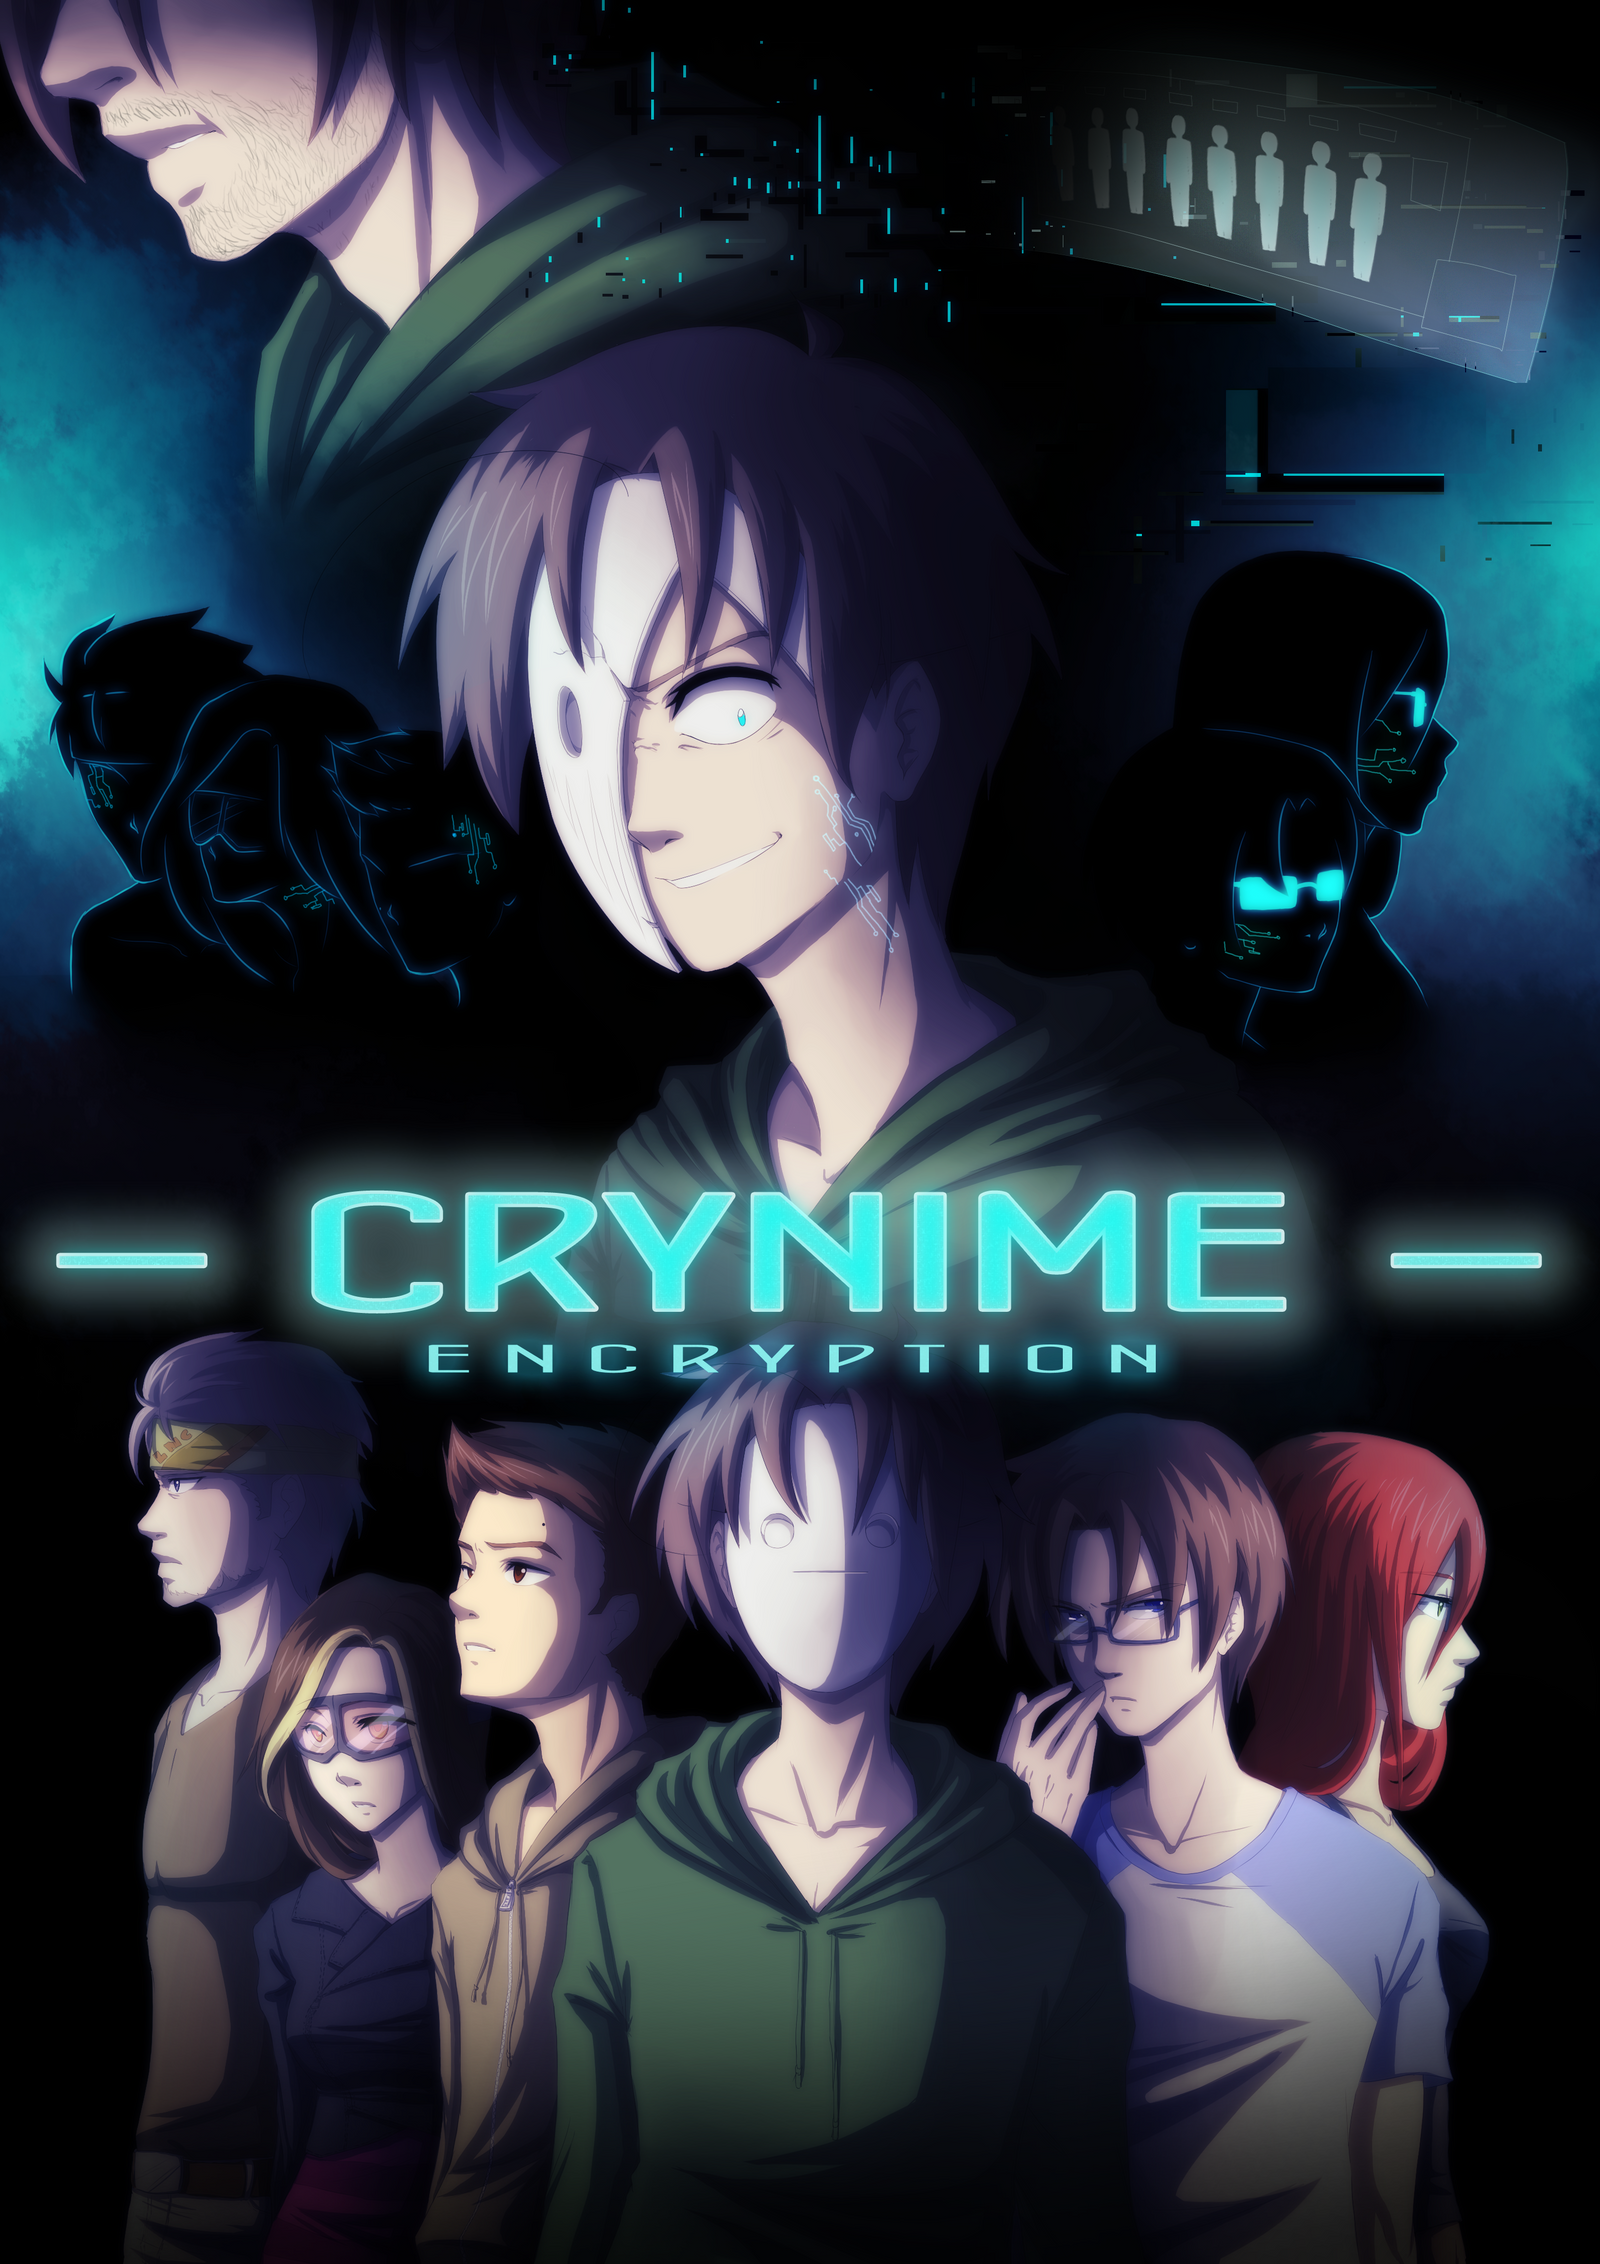 Project Crynime: E N C R Y P T I O N by Kiwa007